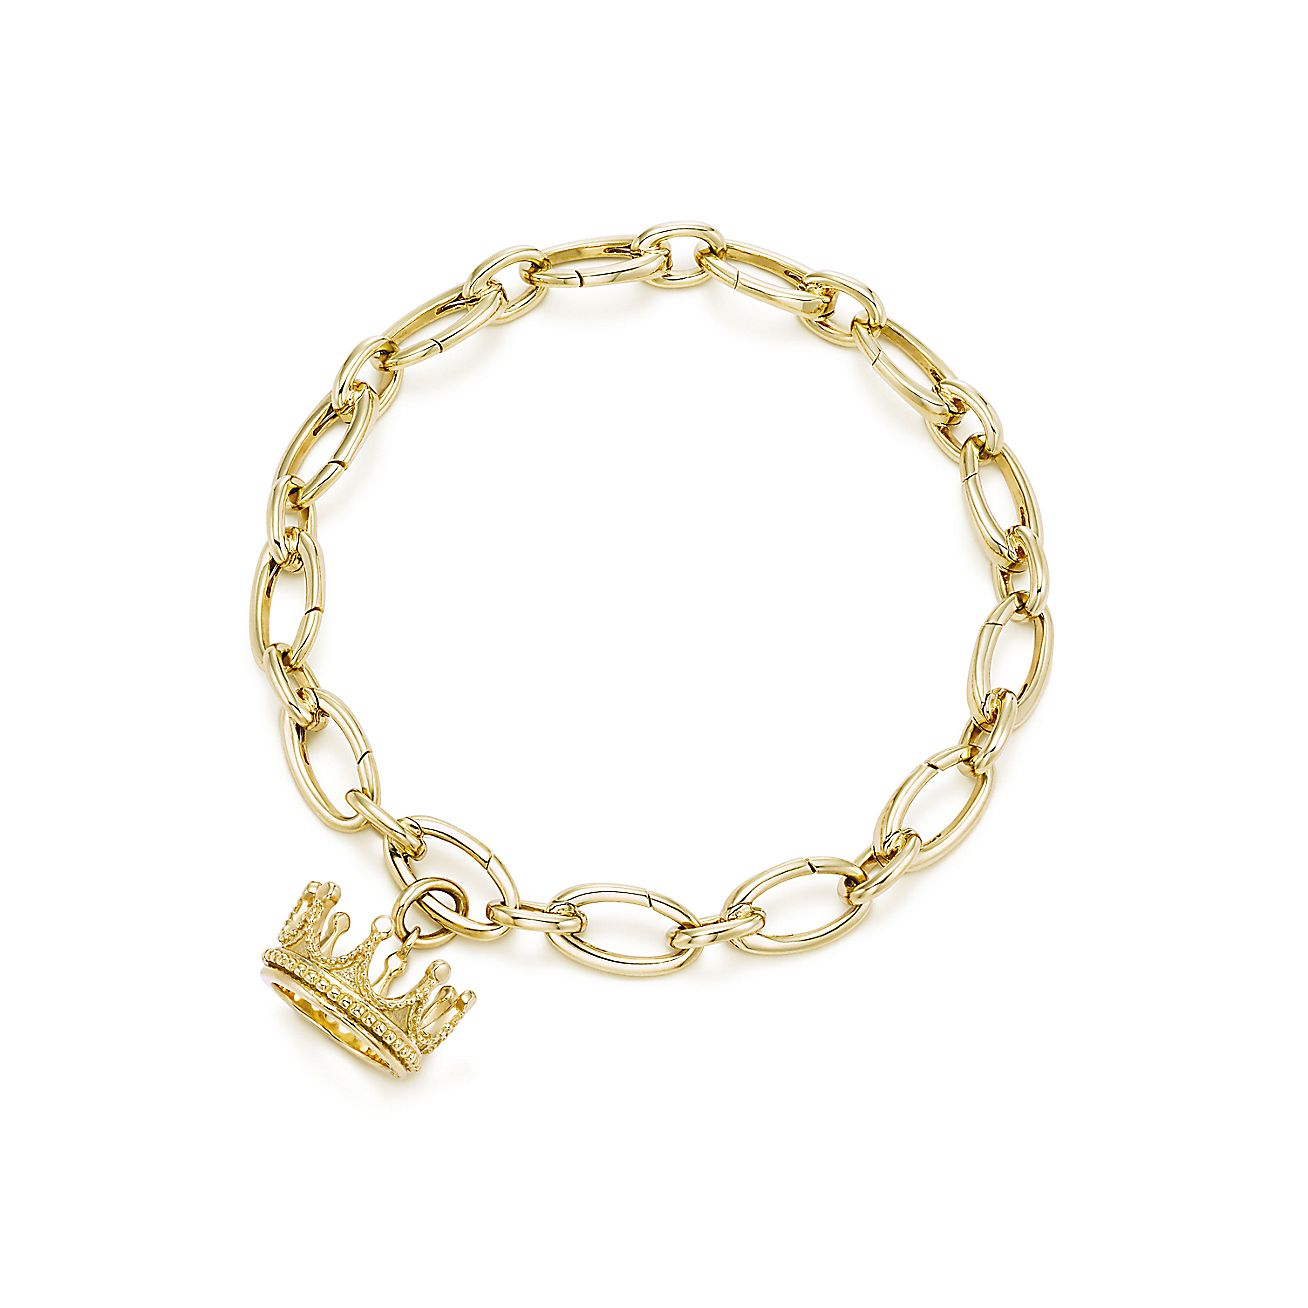 Crown Charm Bracelet: Crown Charm In 18k Gold On A Link Clasp Bracelet